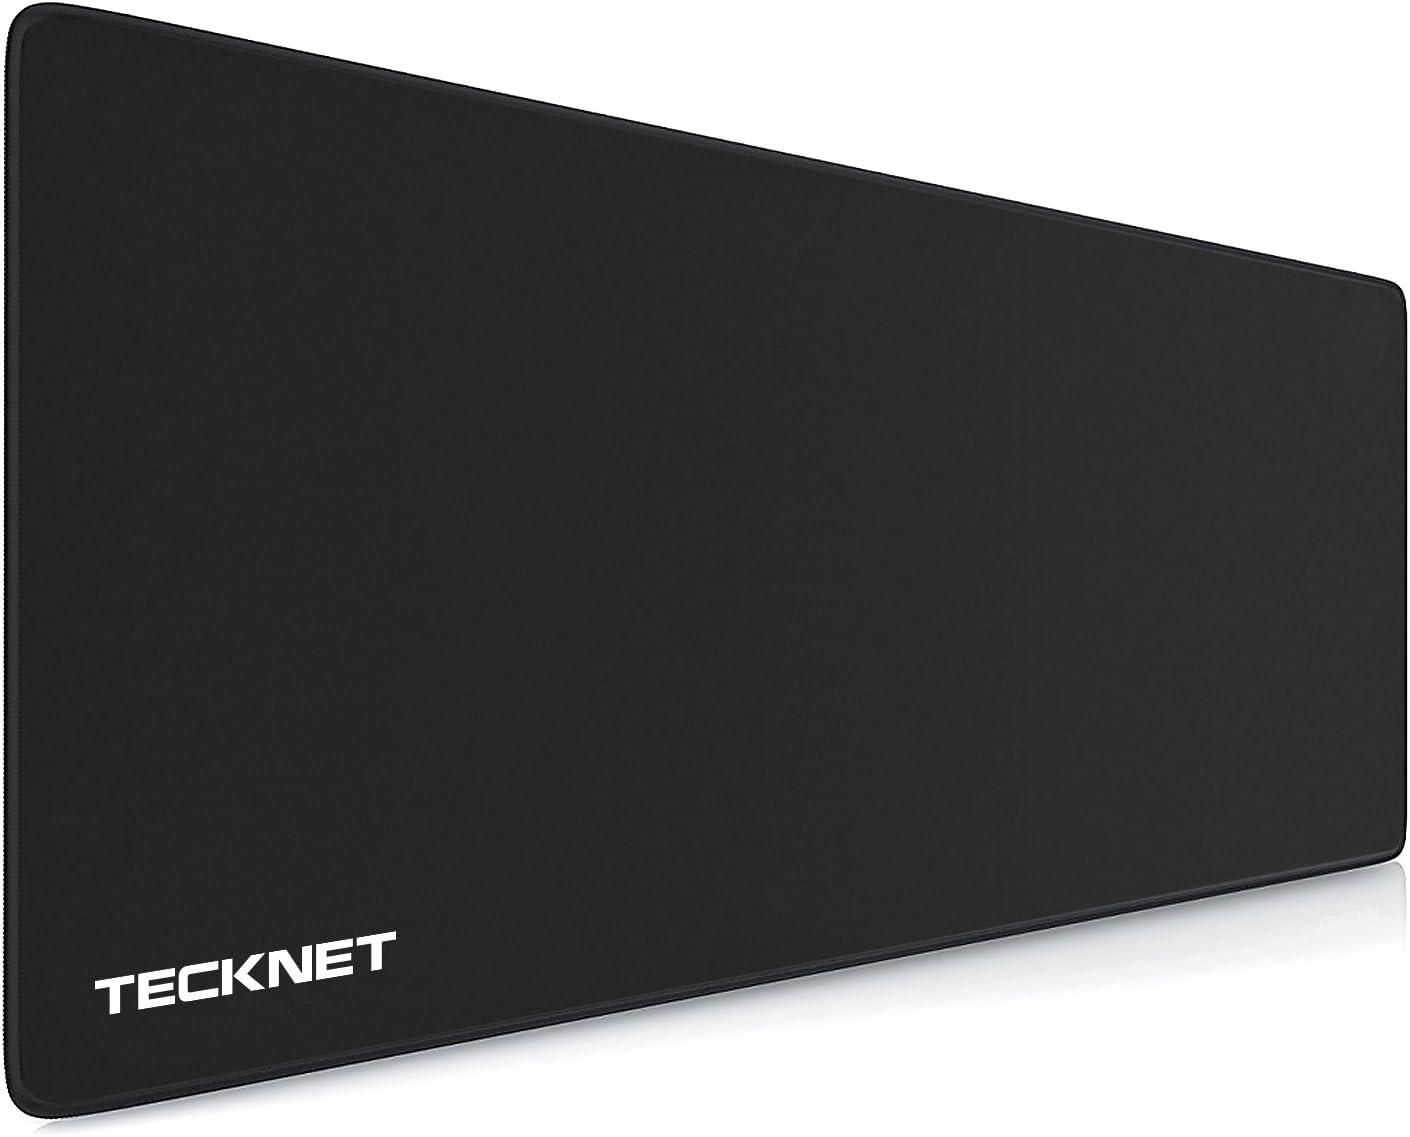 Gaming Mauspad Tecknet Xxl 900x450x3mm Computer Zubehör